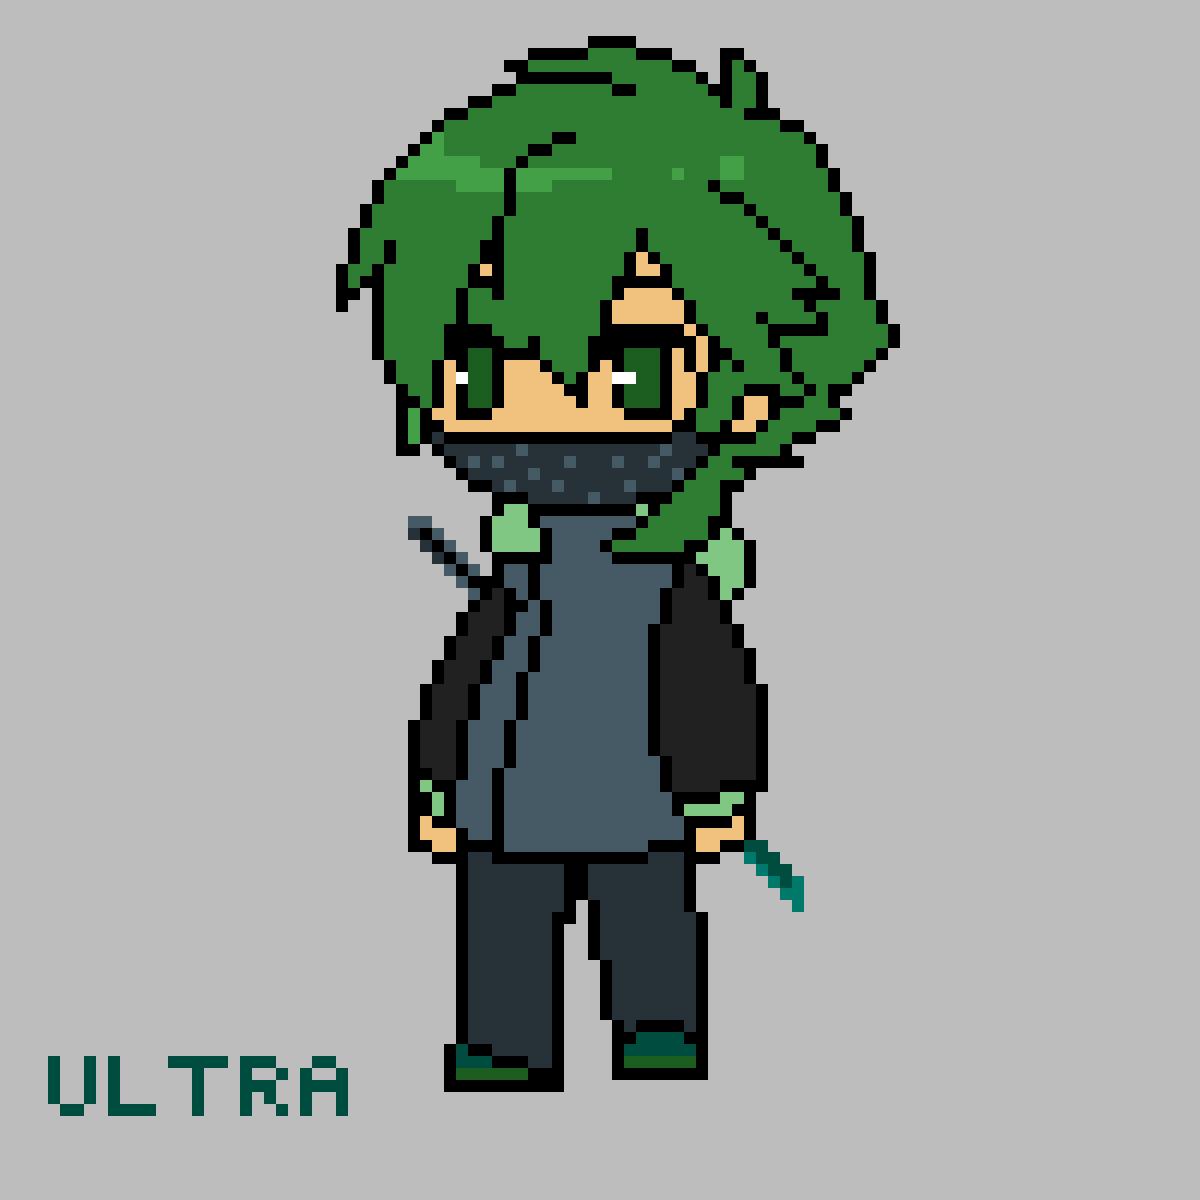 Ultracruz by Ultracruz